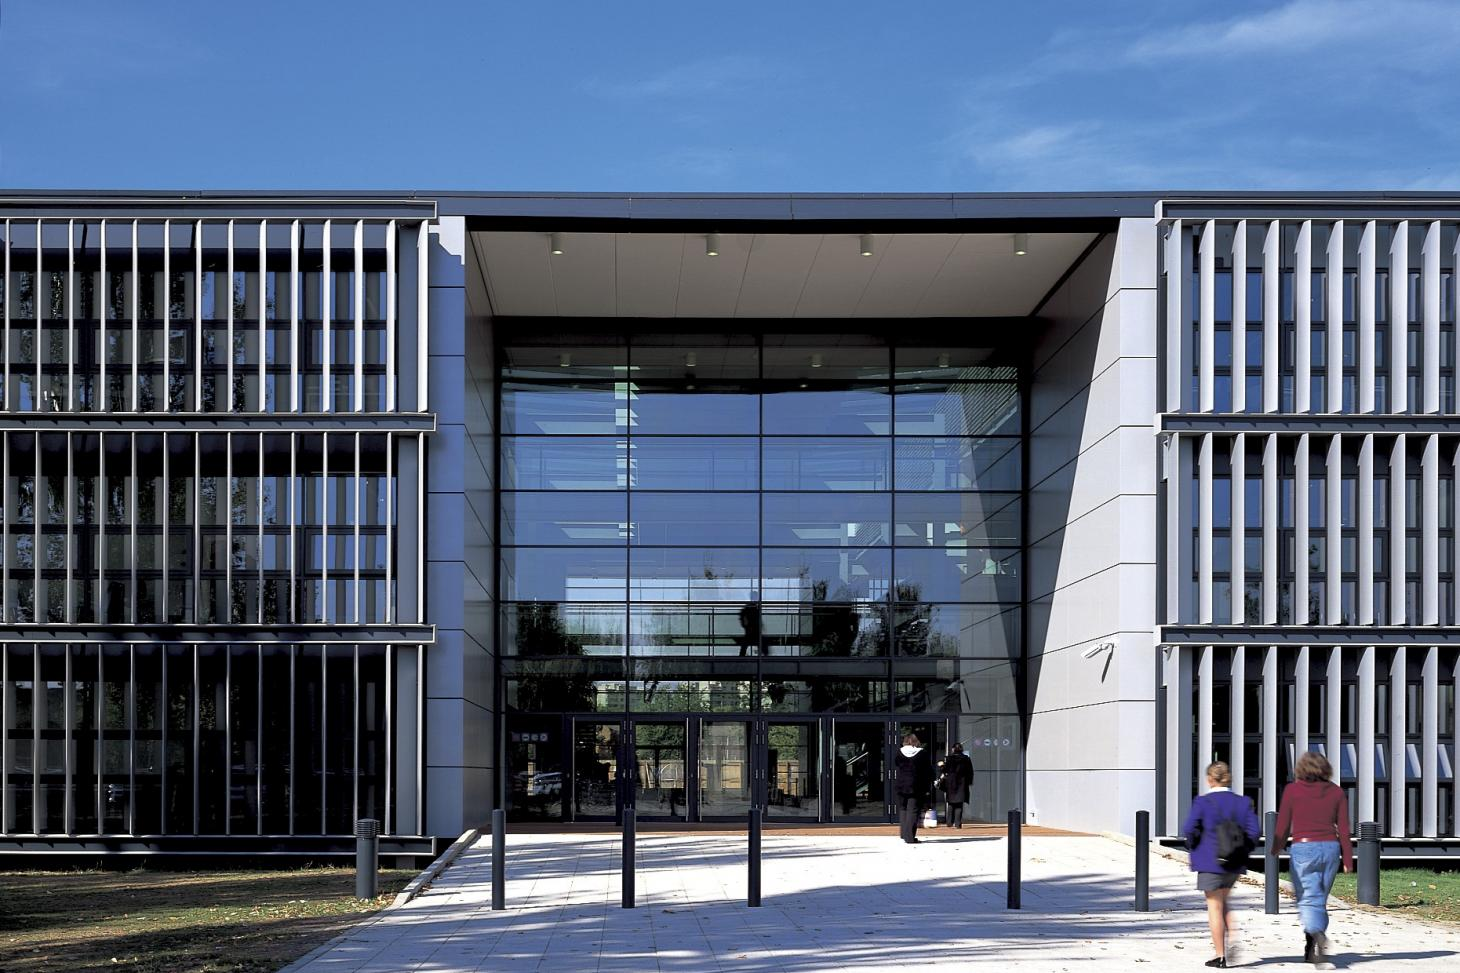 The Business Academy Bexley Indoor netball court